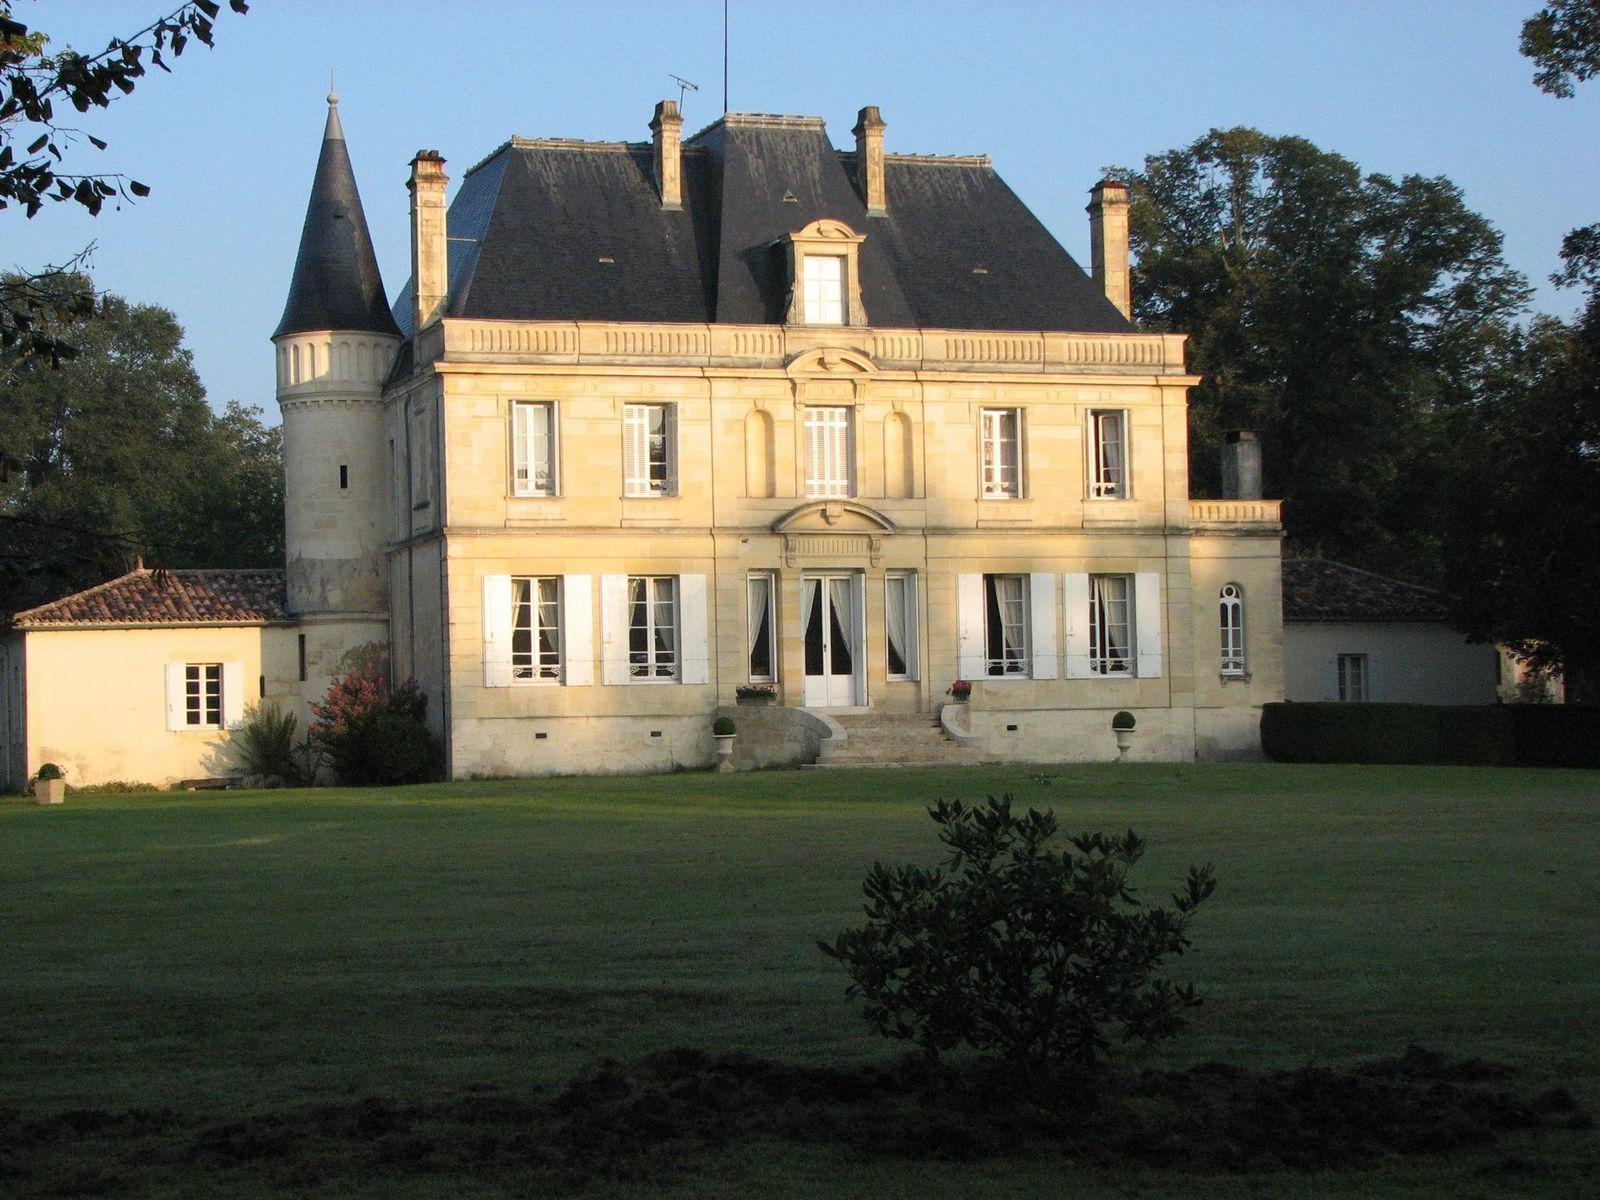 Image : Syndicat d'Initiative de Castelnau-de-médoc